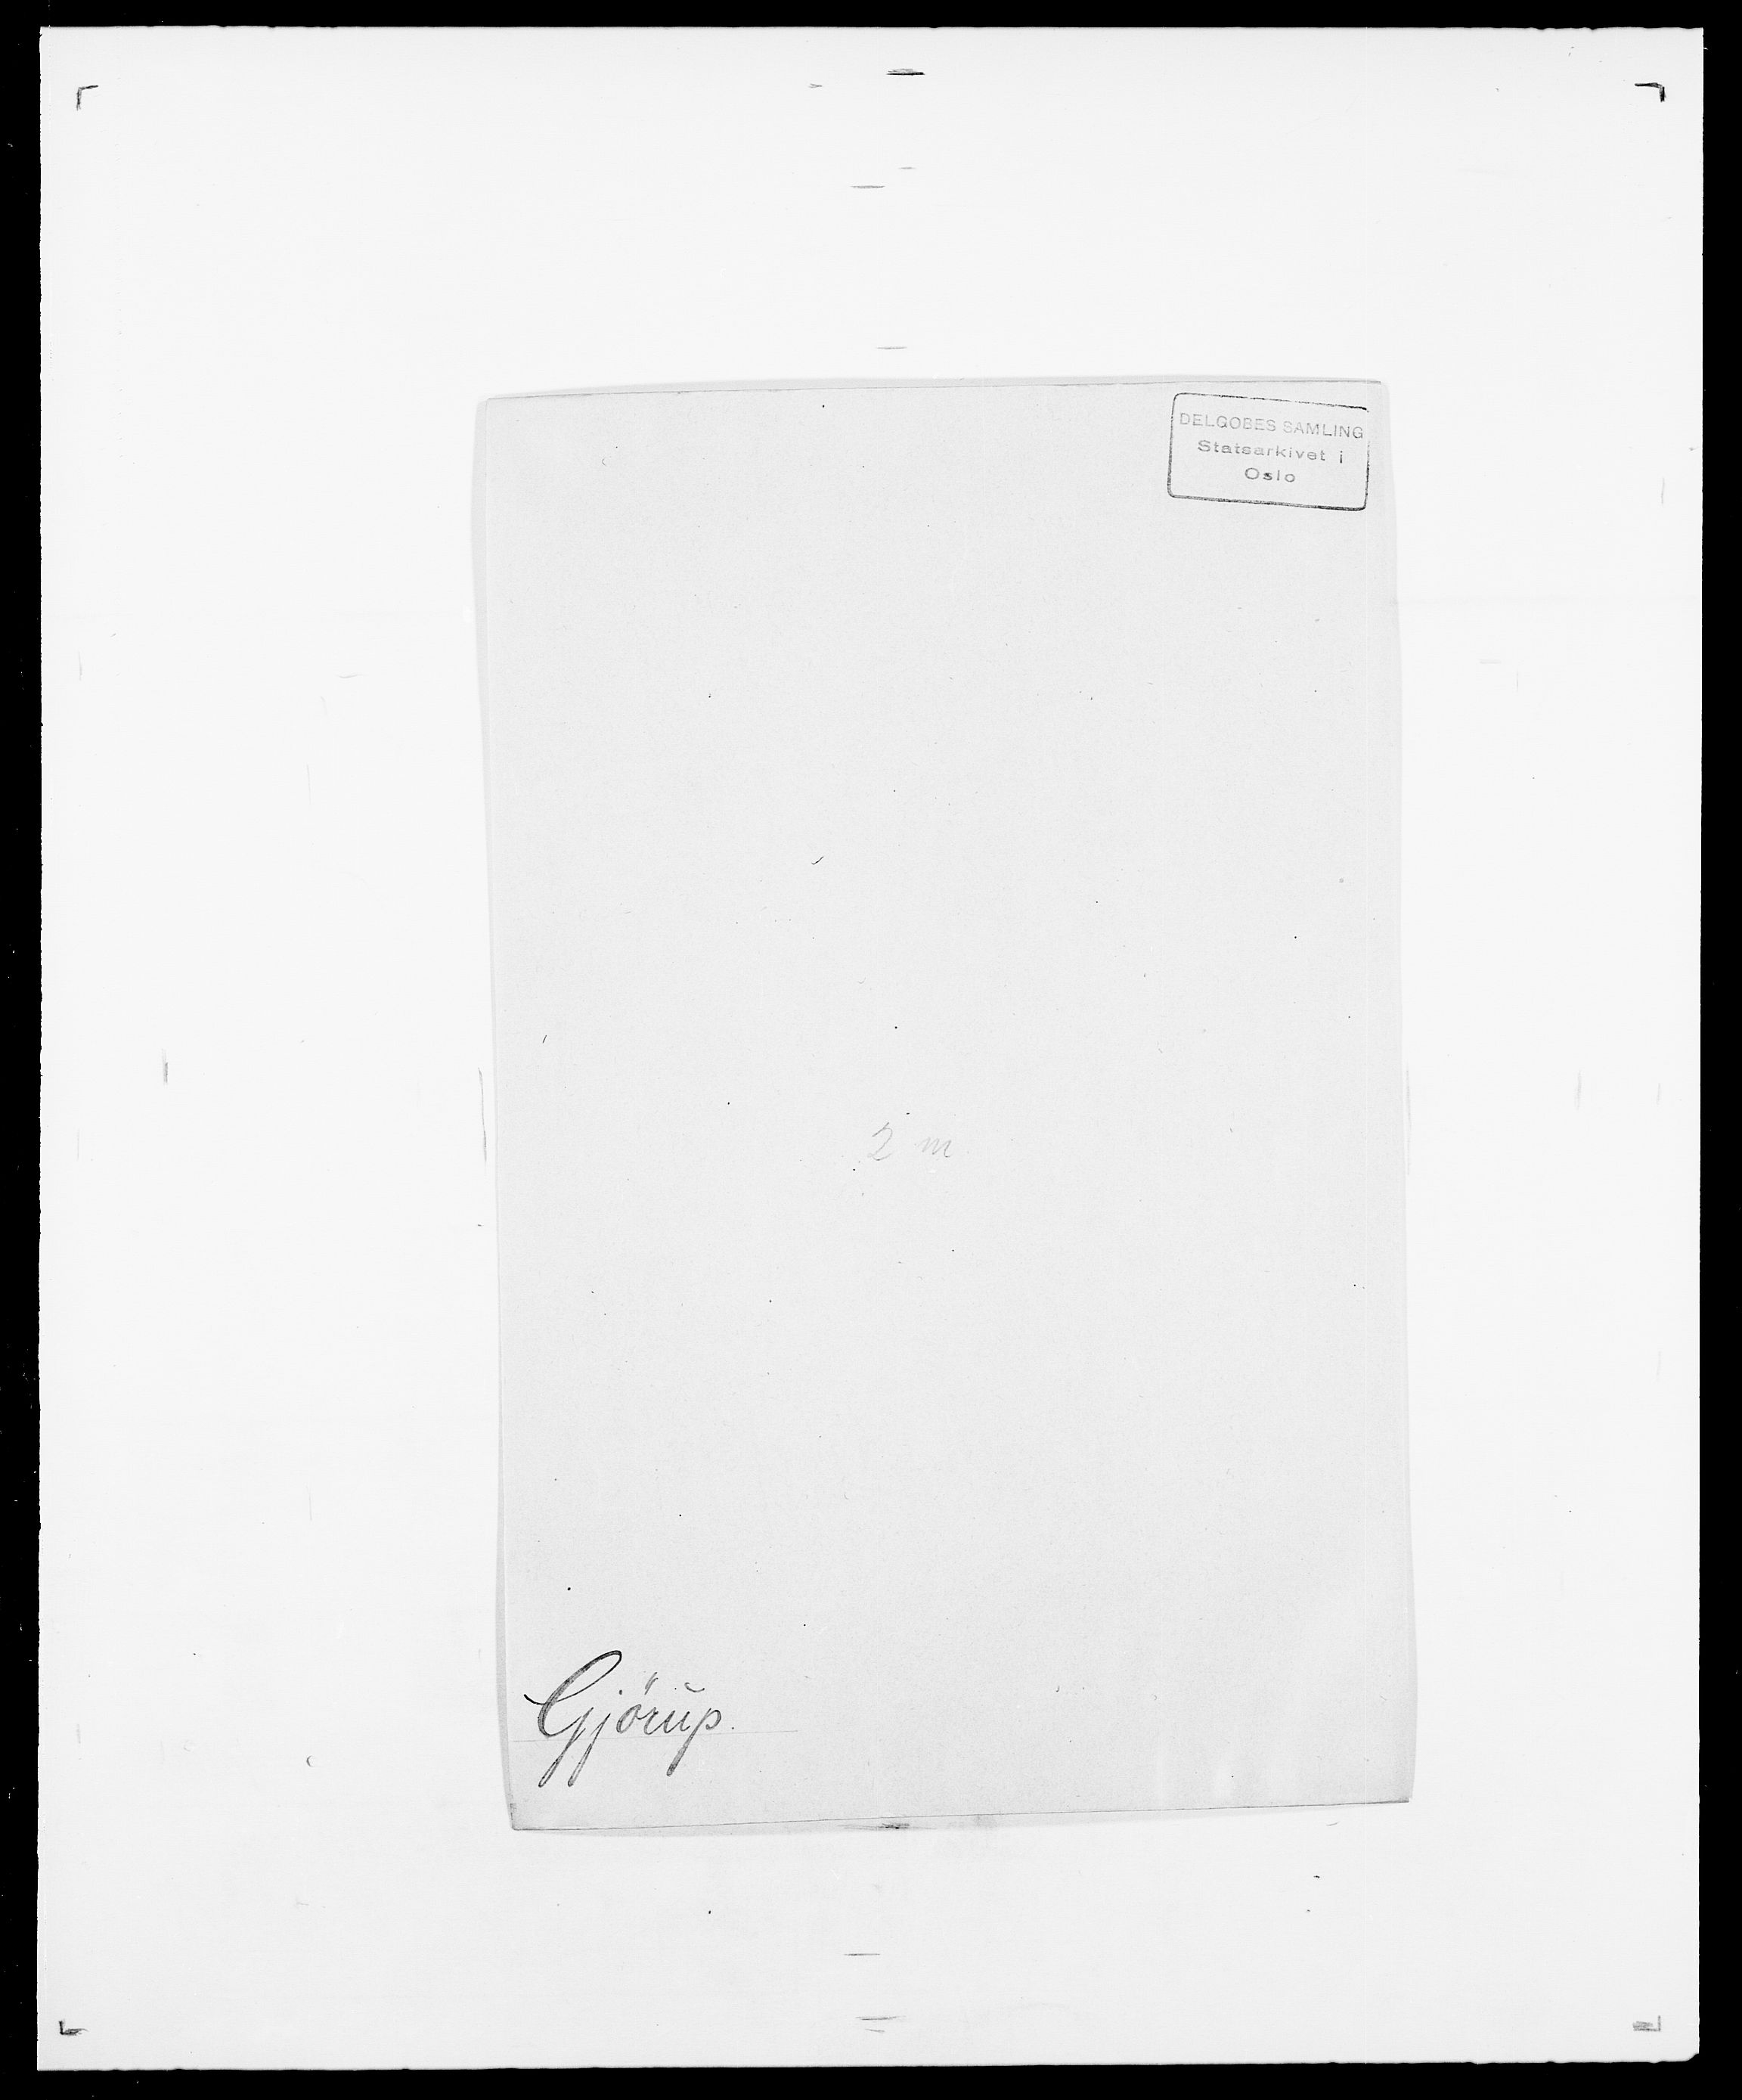 SAO, Delgobe, Charles Antoine - samling, D/Da/L0014: Giebdhausen - Grip, s. 224